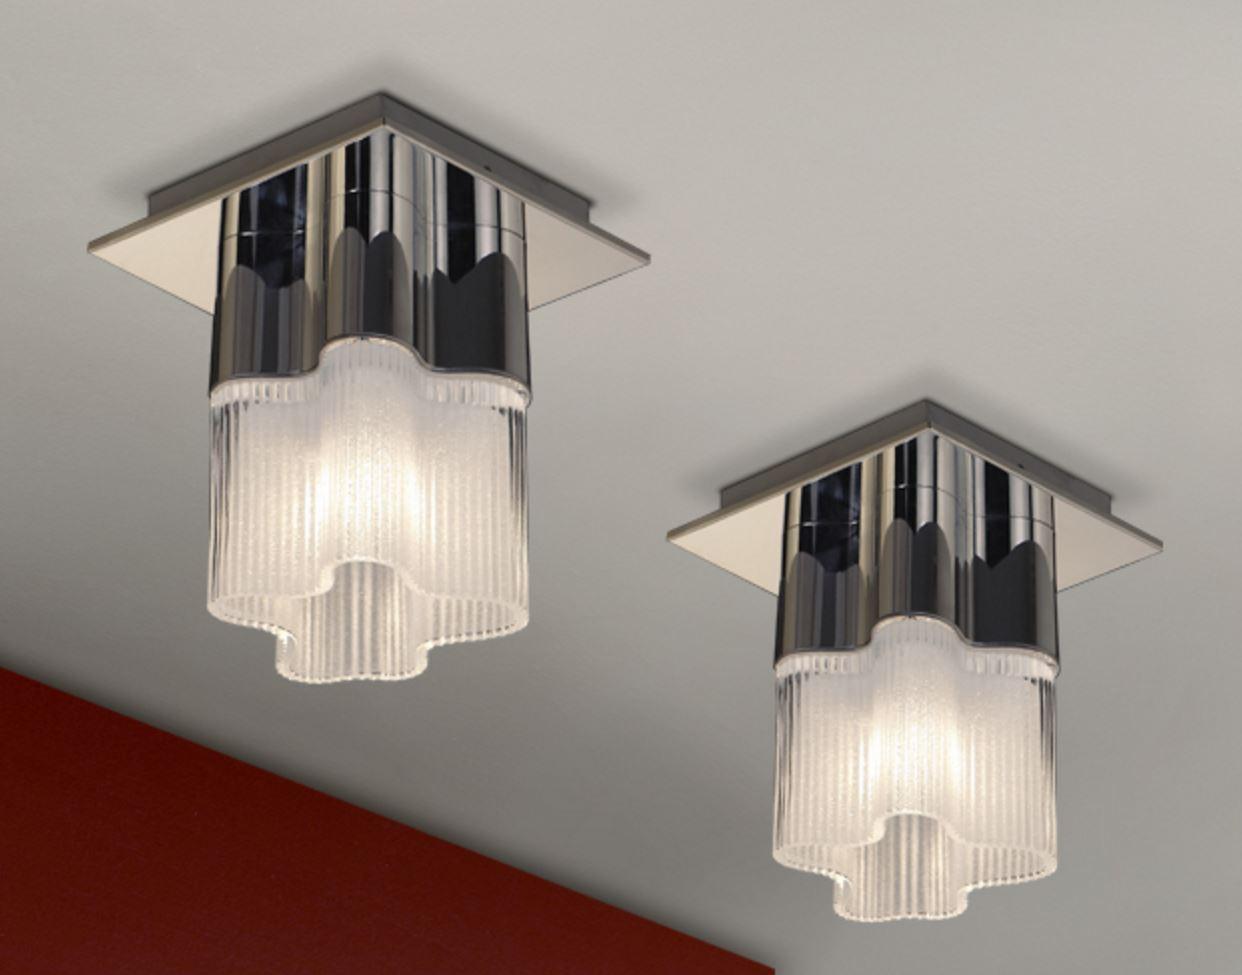 Flor ceiling lamp 23x19cm 1xG9 40W - steel brillo lampshade Glass matizado